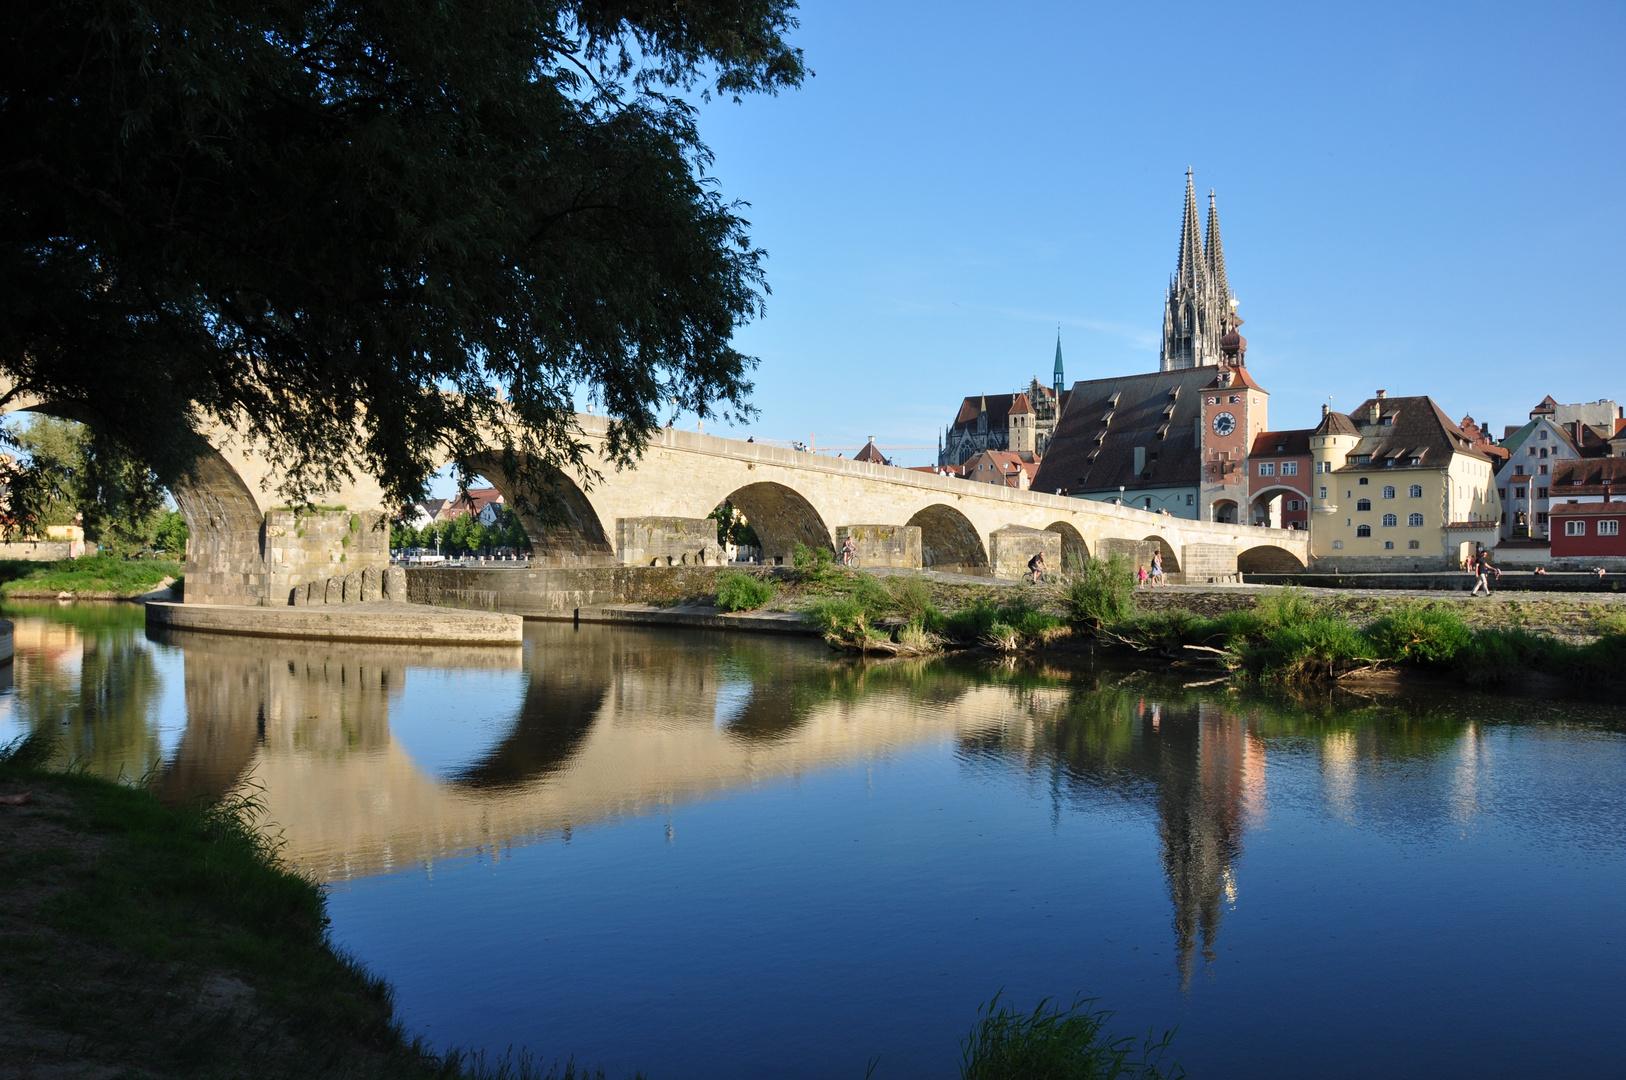 Regensburg, Steinerne Brücke